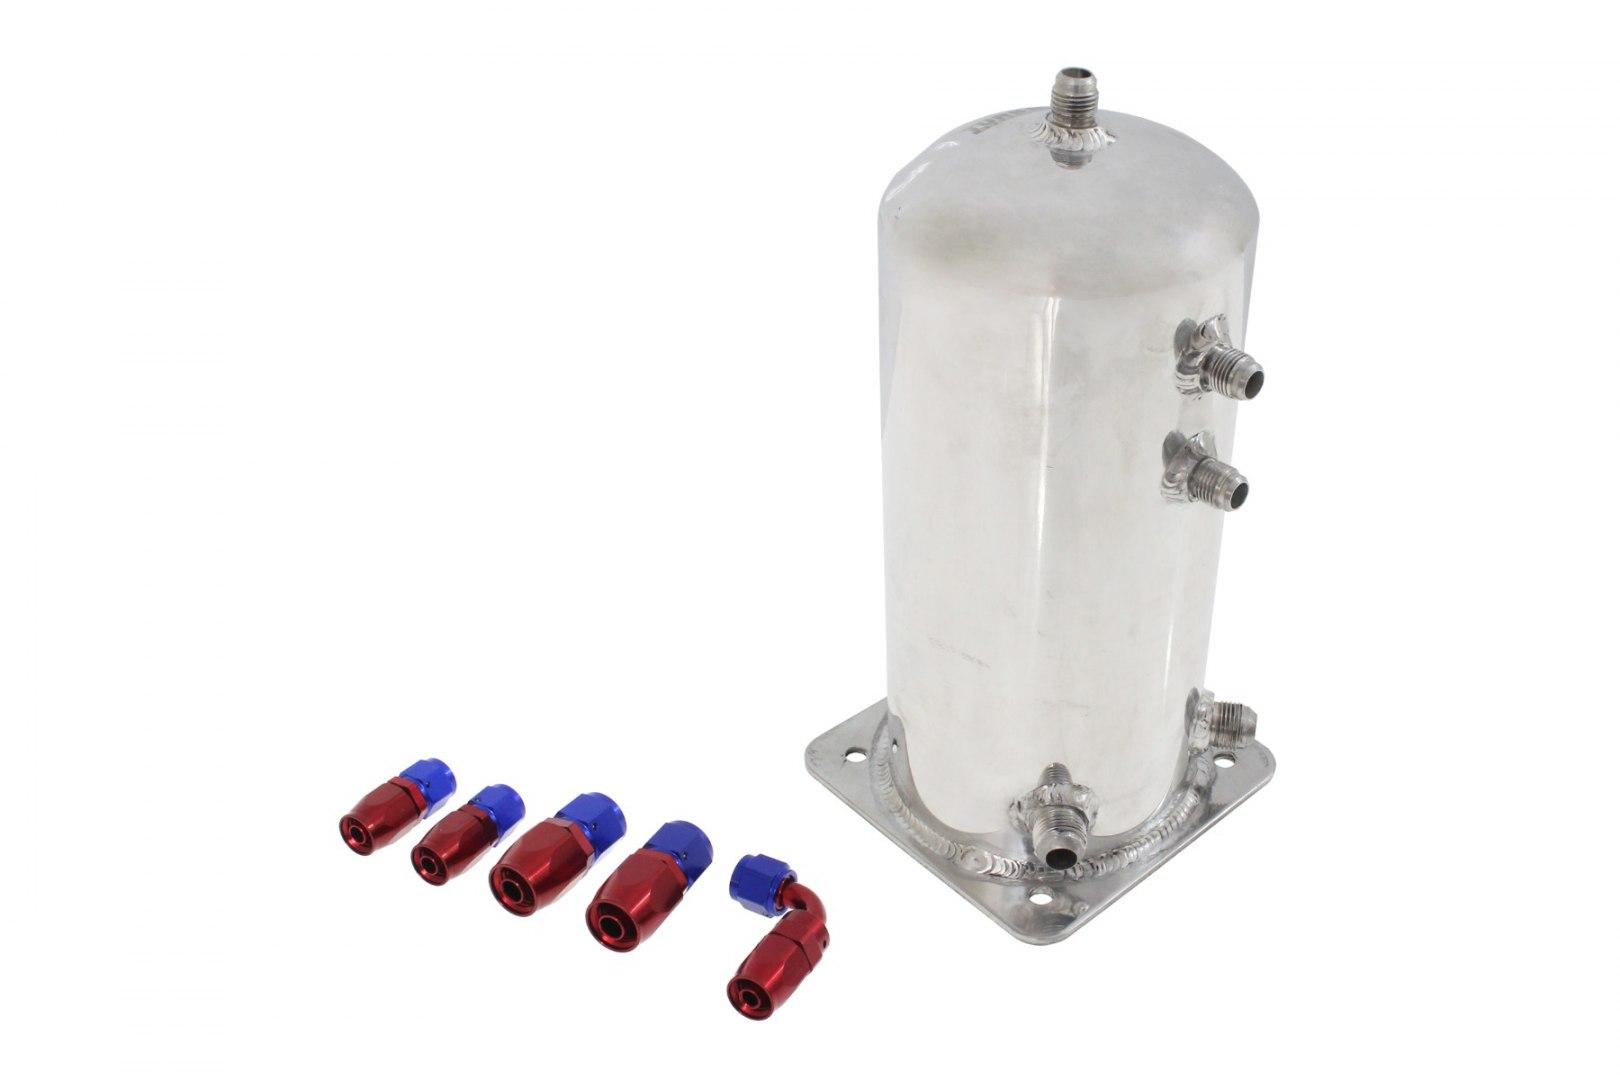 Zbiornik Paliwa TurboWorks 2,5L + Fittings Swirl Pot - GRUBYGARAGE - Sklep Tuningowy